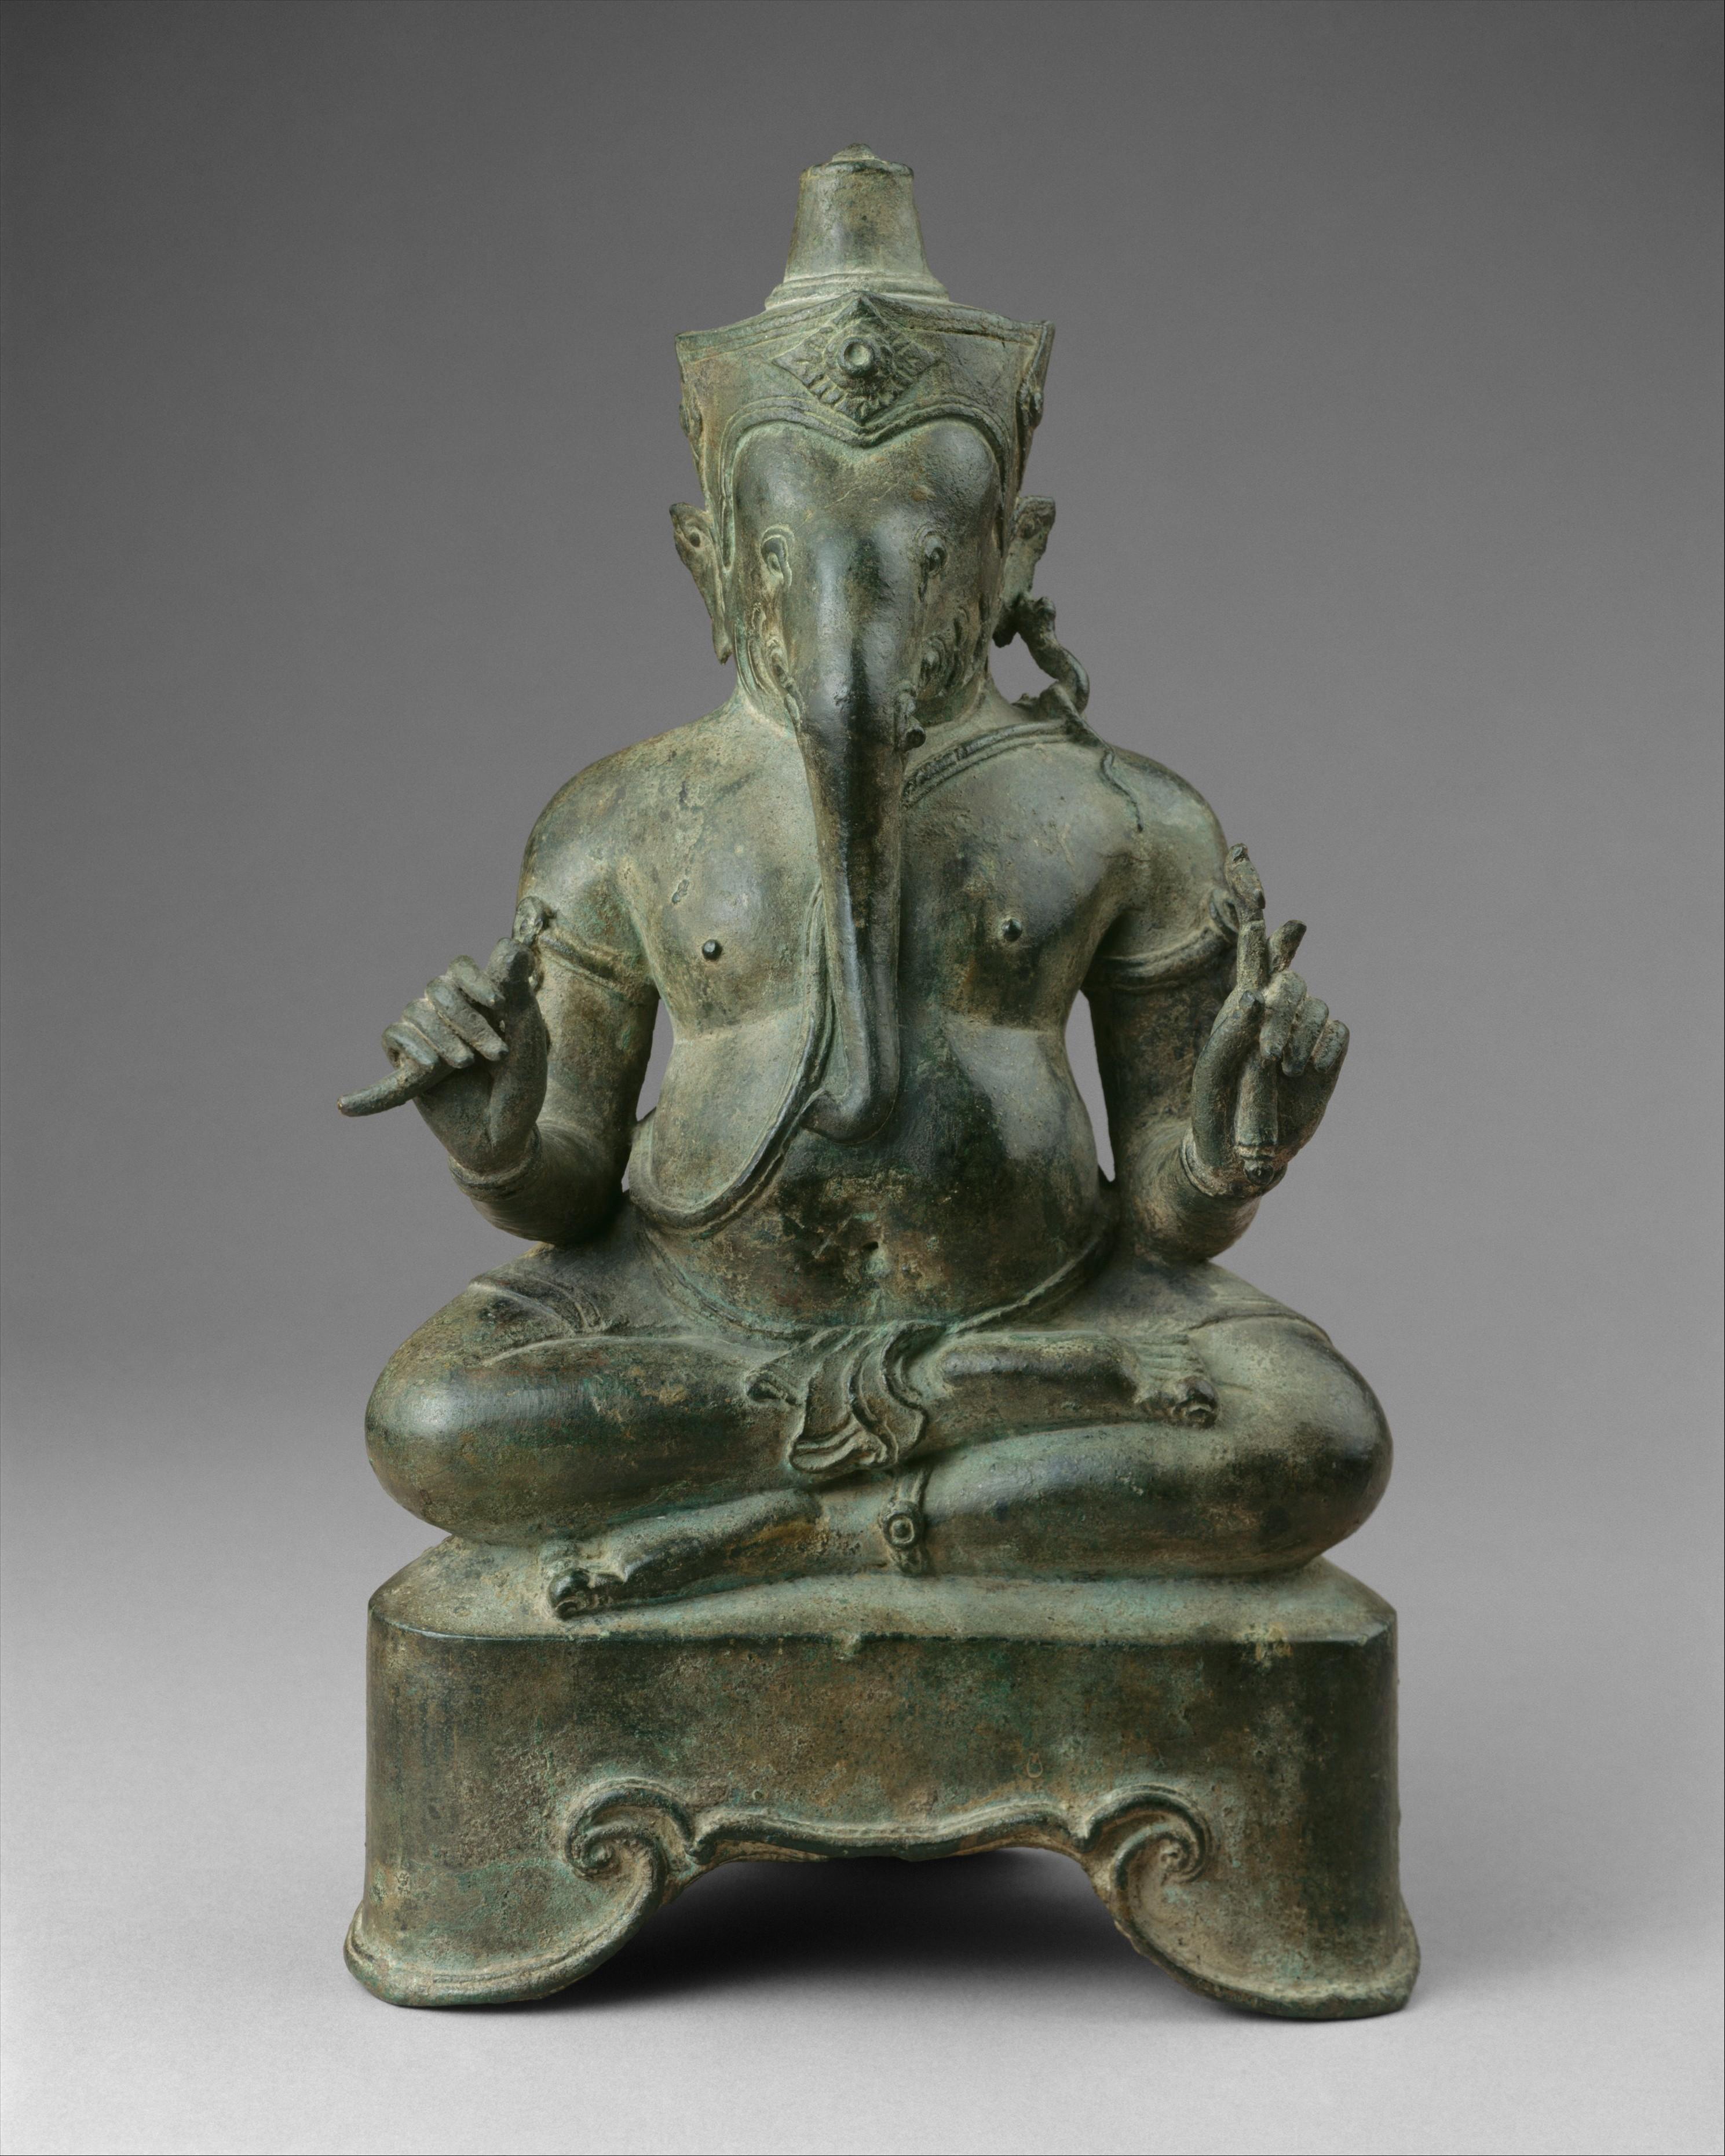 Iconography of Ganesh